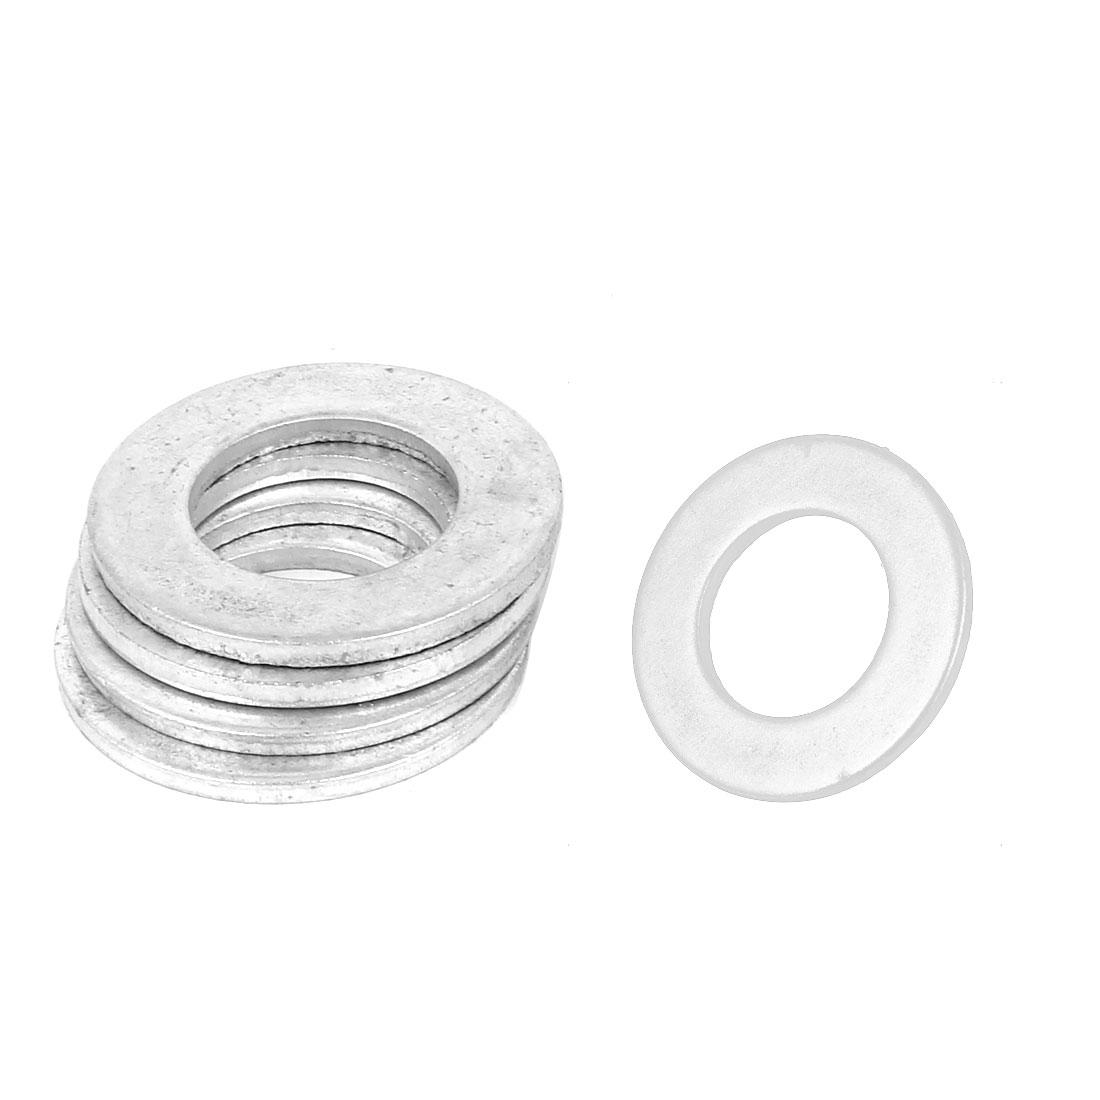 24mm x 44mm Zinc Plated Flat Pads Washers Gaskets Fasteners GB97 5PCS